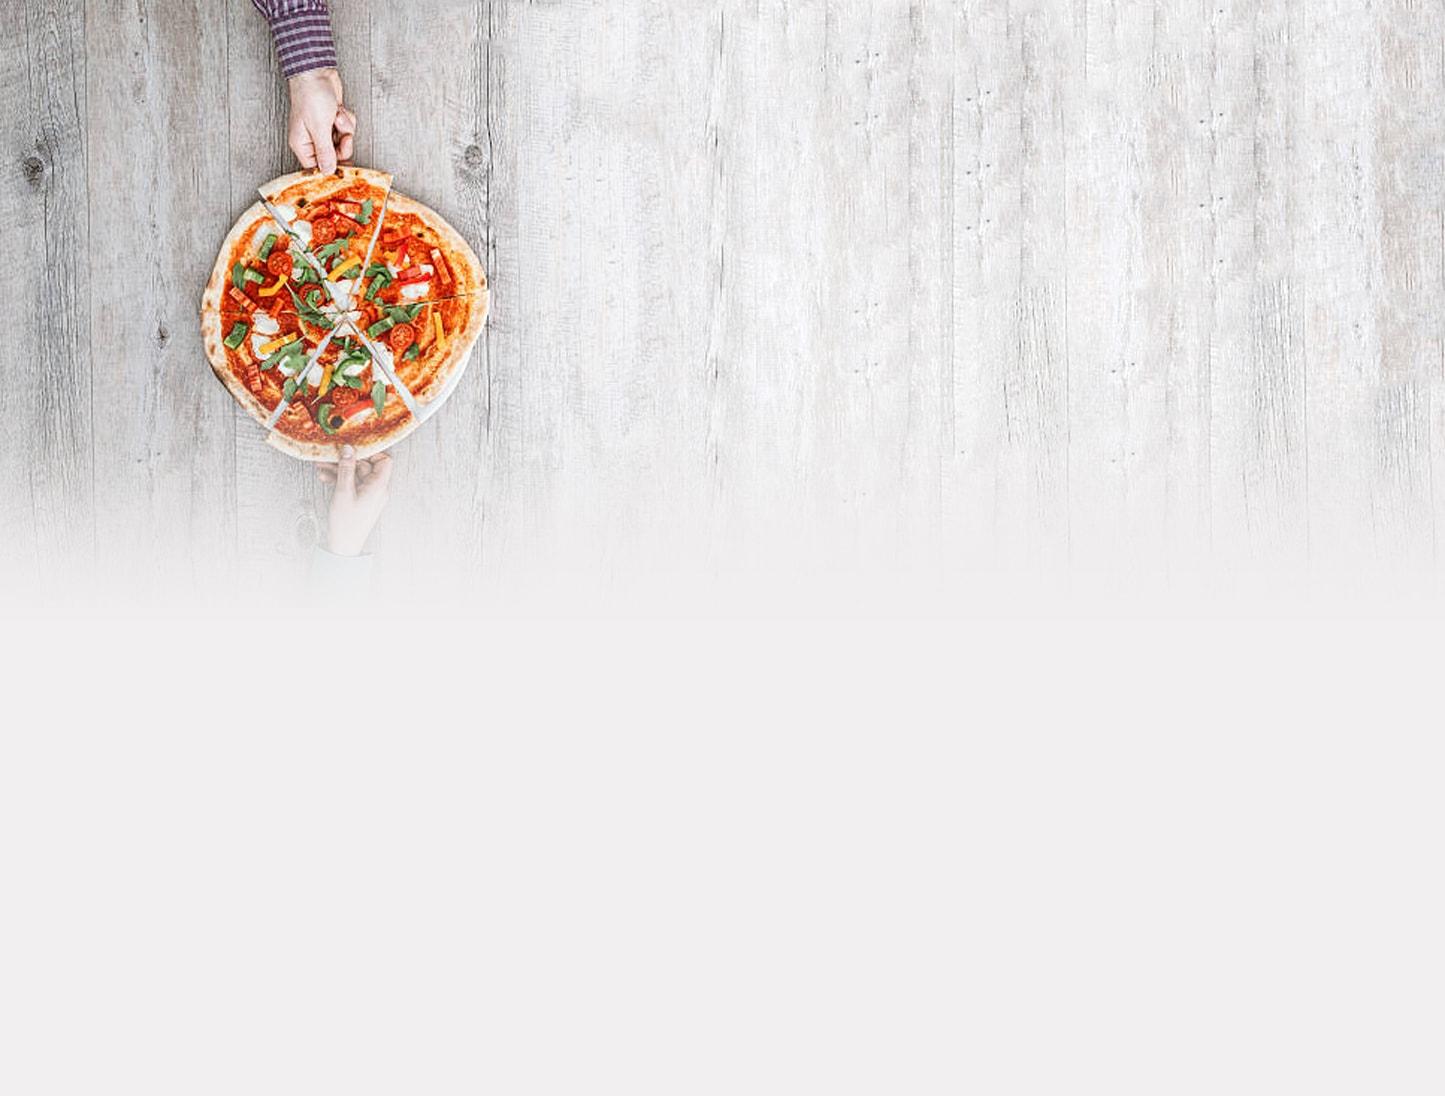 FSM---Foodservice-event-2018---Bg-Img-min.jpg